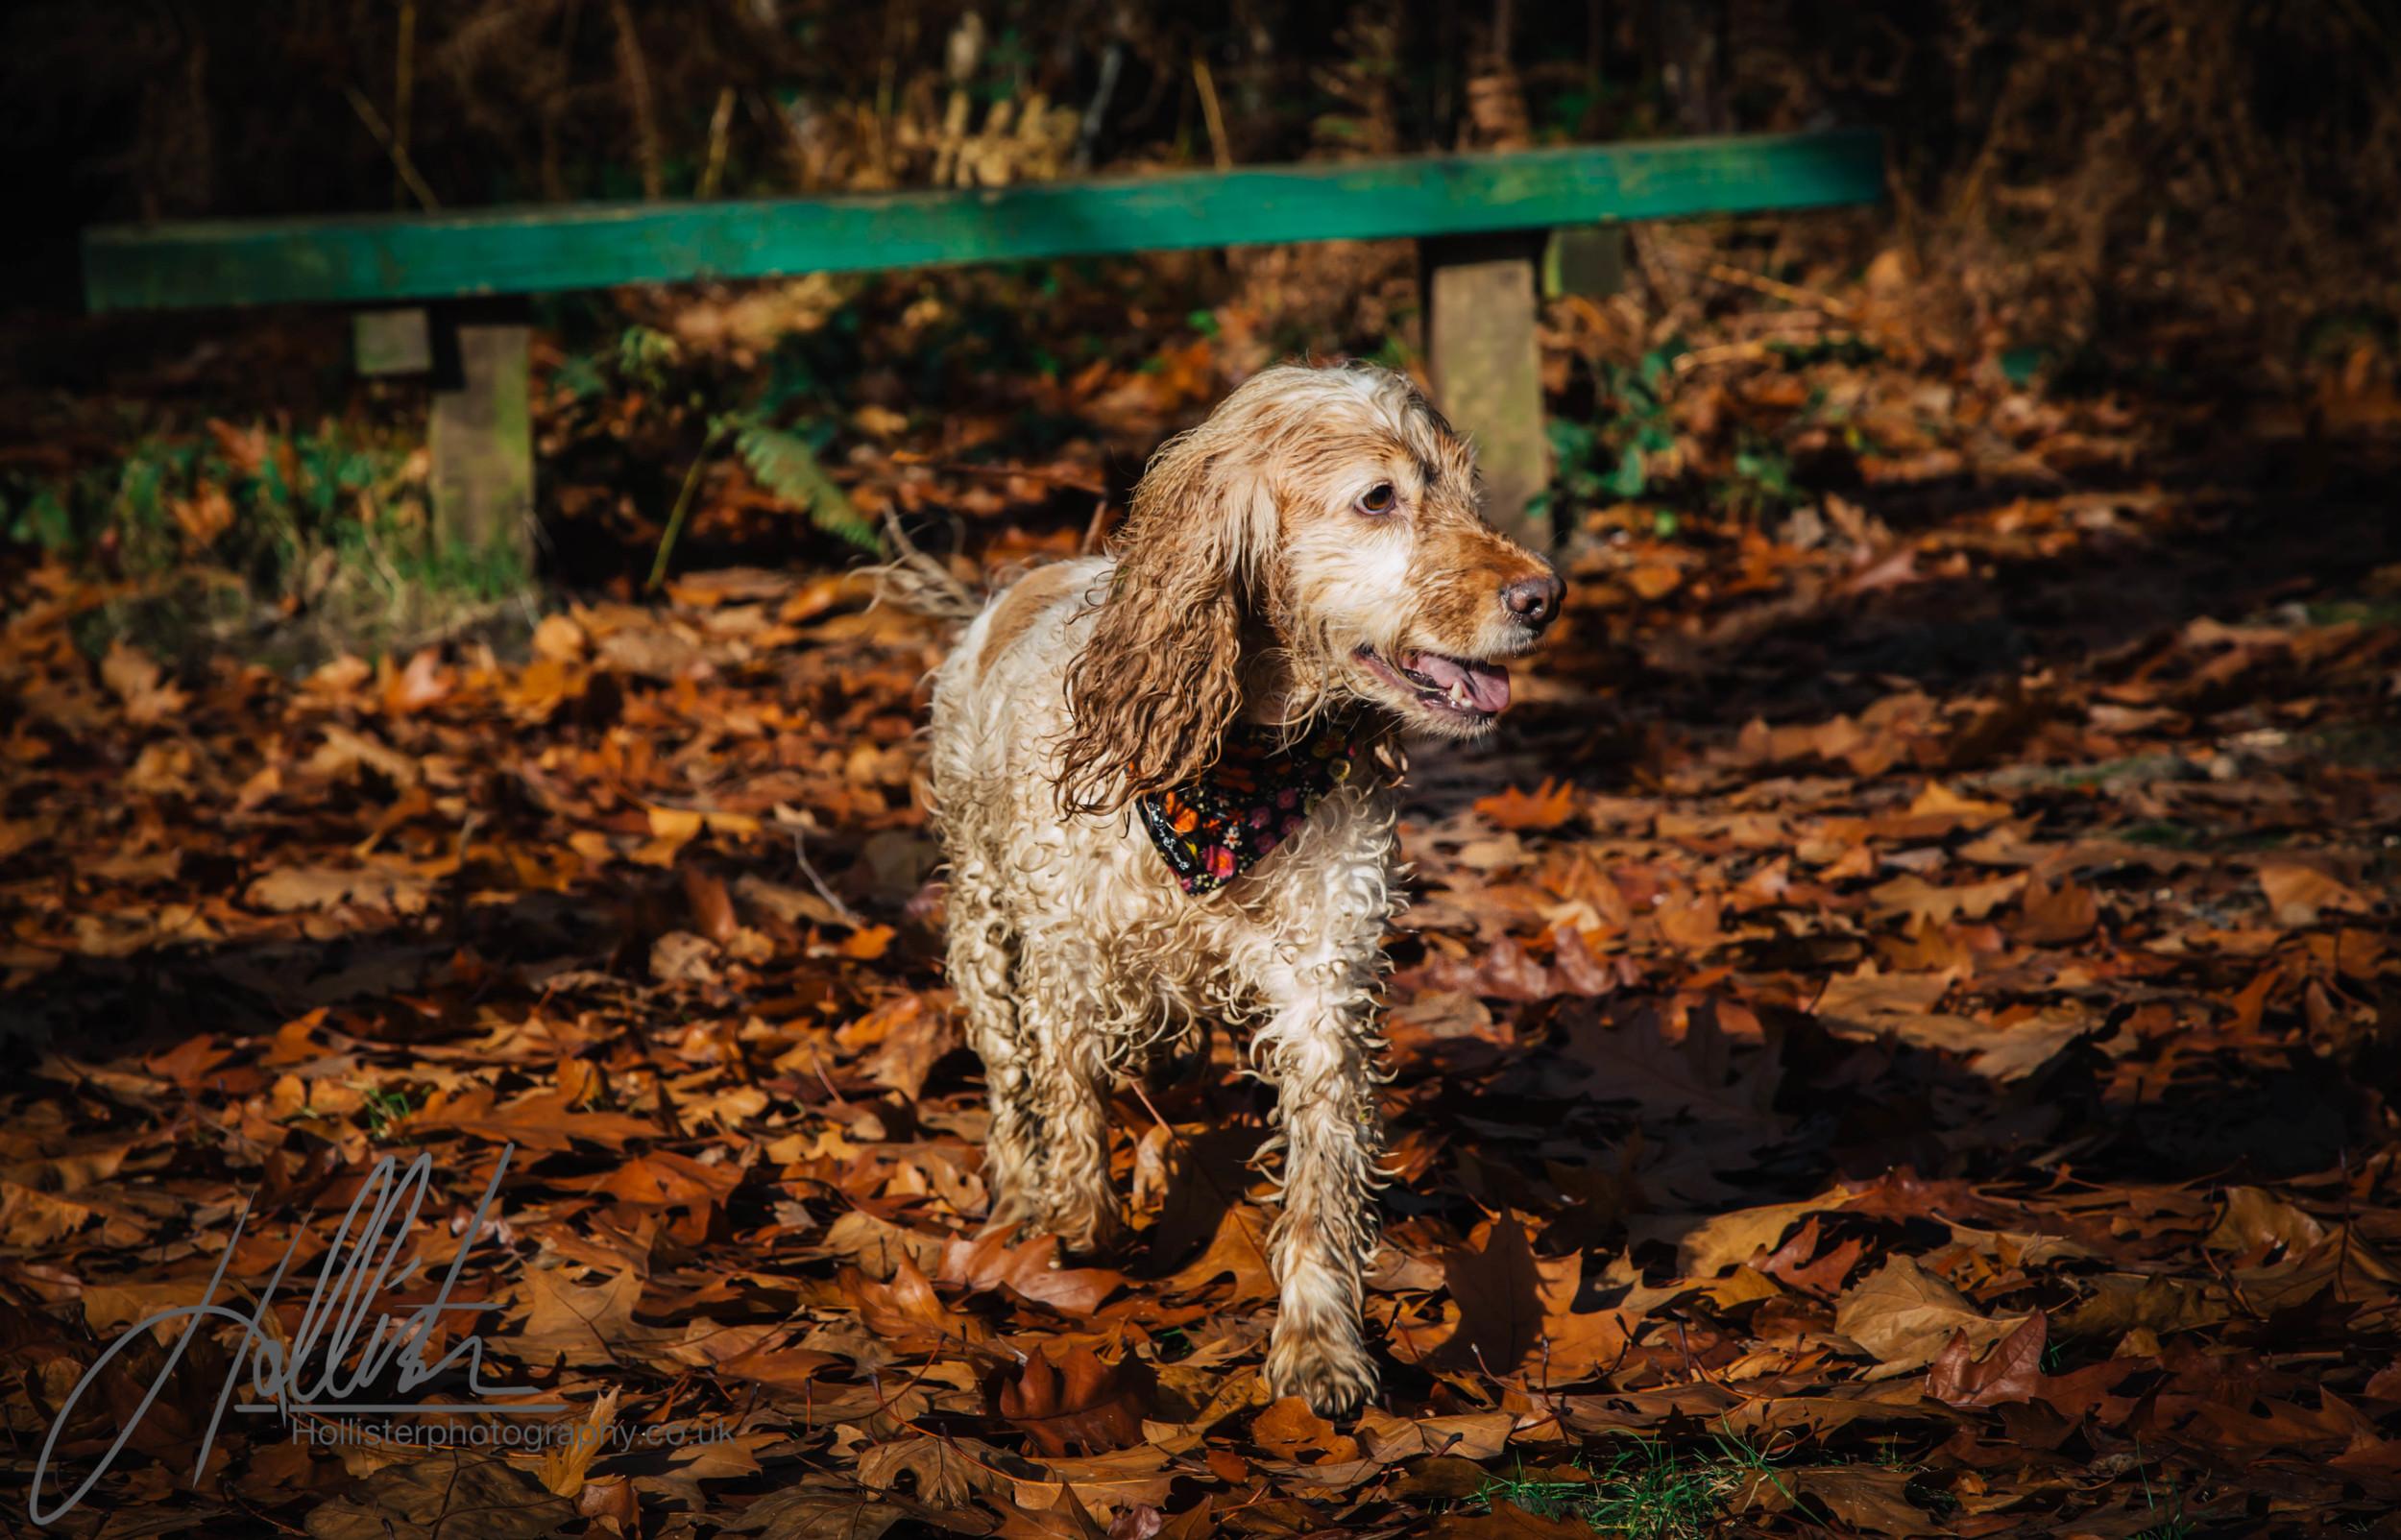 Hollisterphotography ABBY CLOWES WOOD DOG WALK-78.JPG